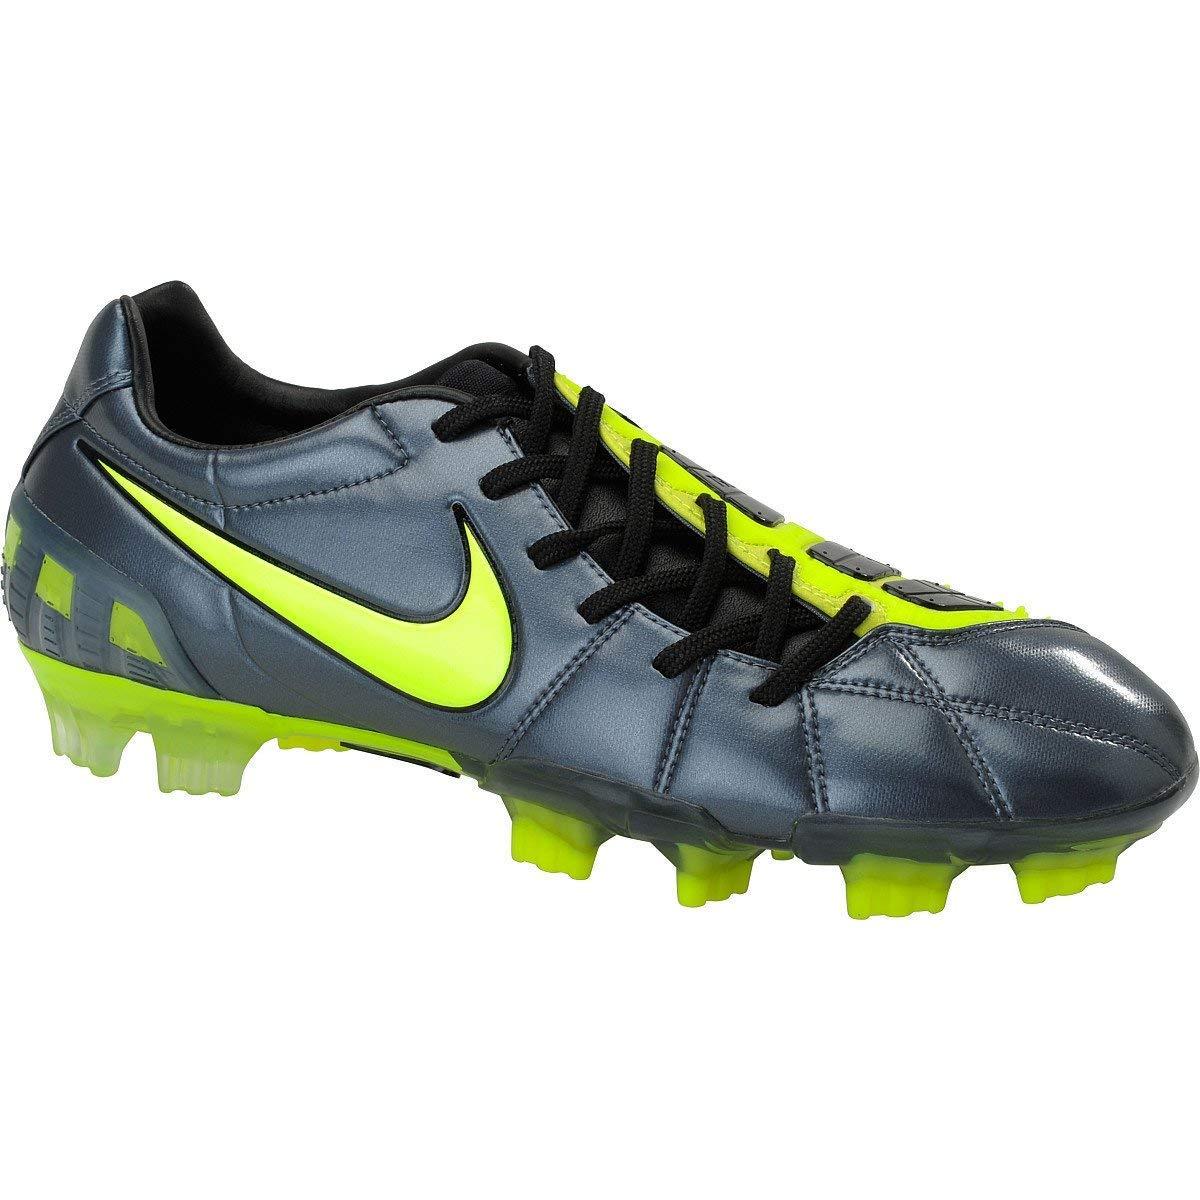 Nike  Herren Soccer Cleats TOTAL90 LASER III FG Metallic Blau   Volt   schwarz SZ 7